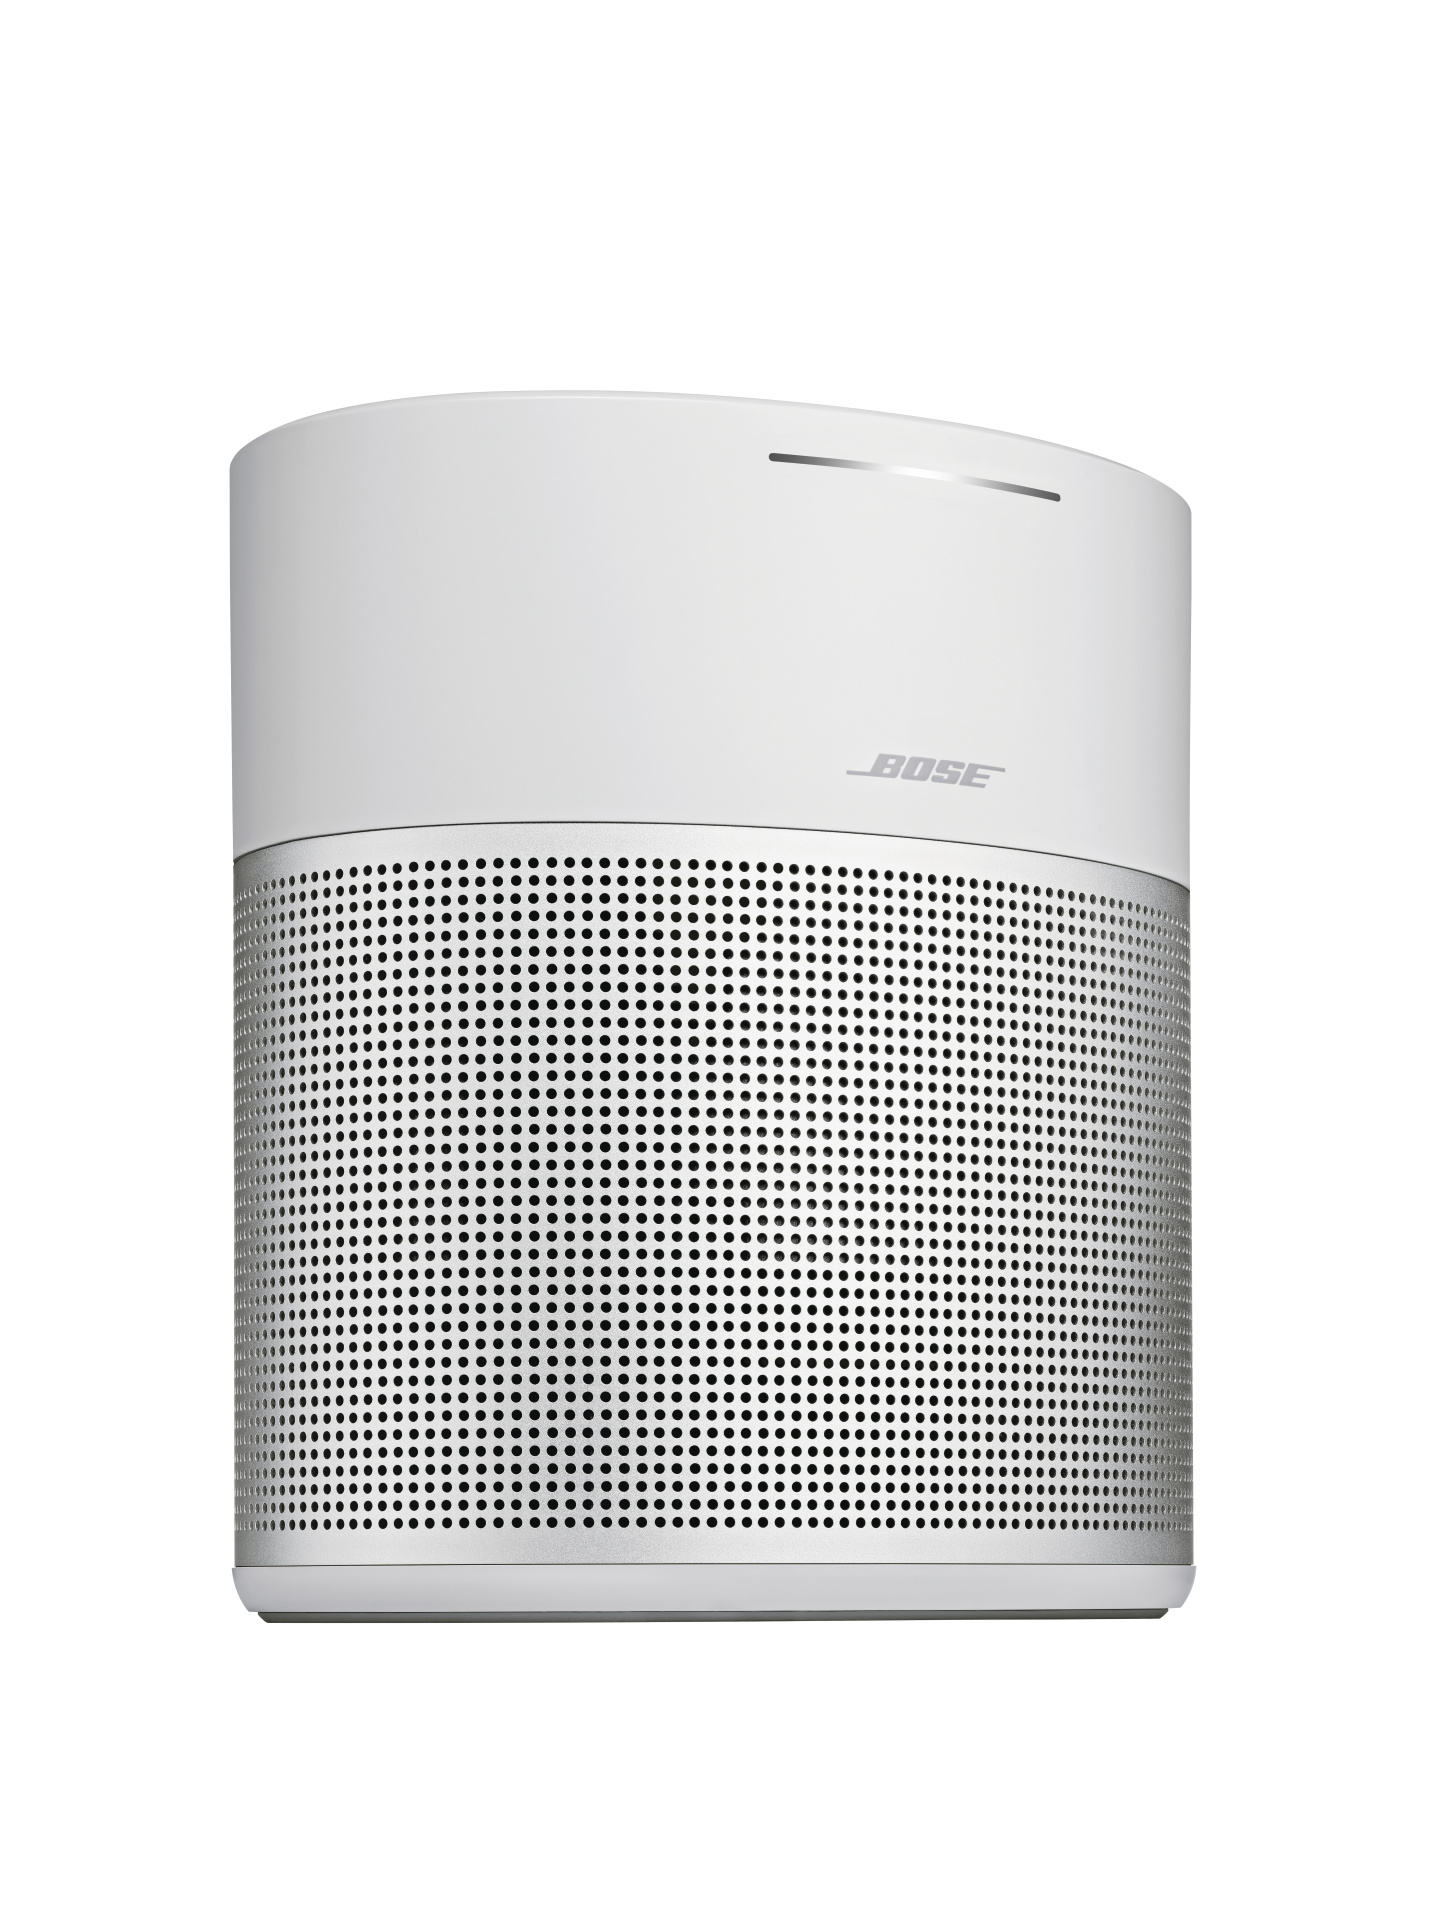 Bose Home Speaker 300 srebrny | Autoryzowany Dealer | Dostępny od ręki!